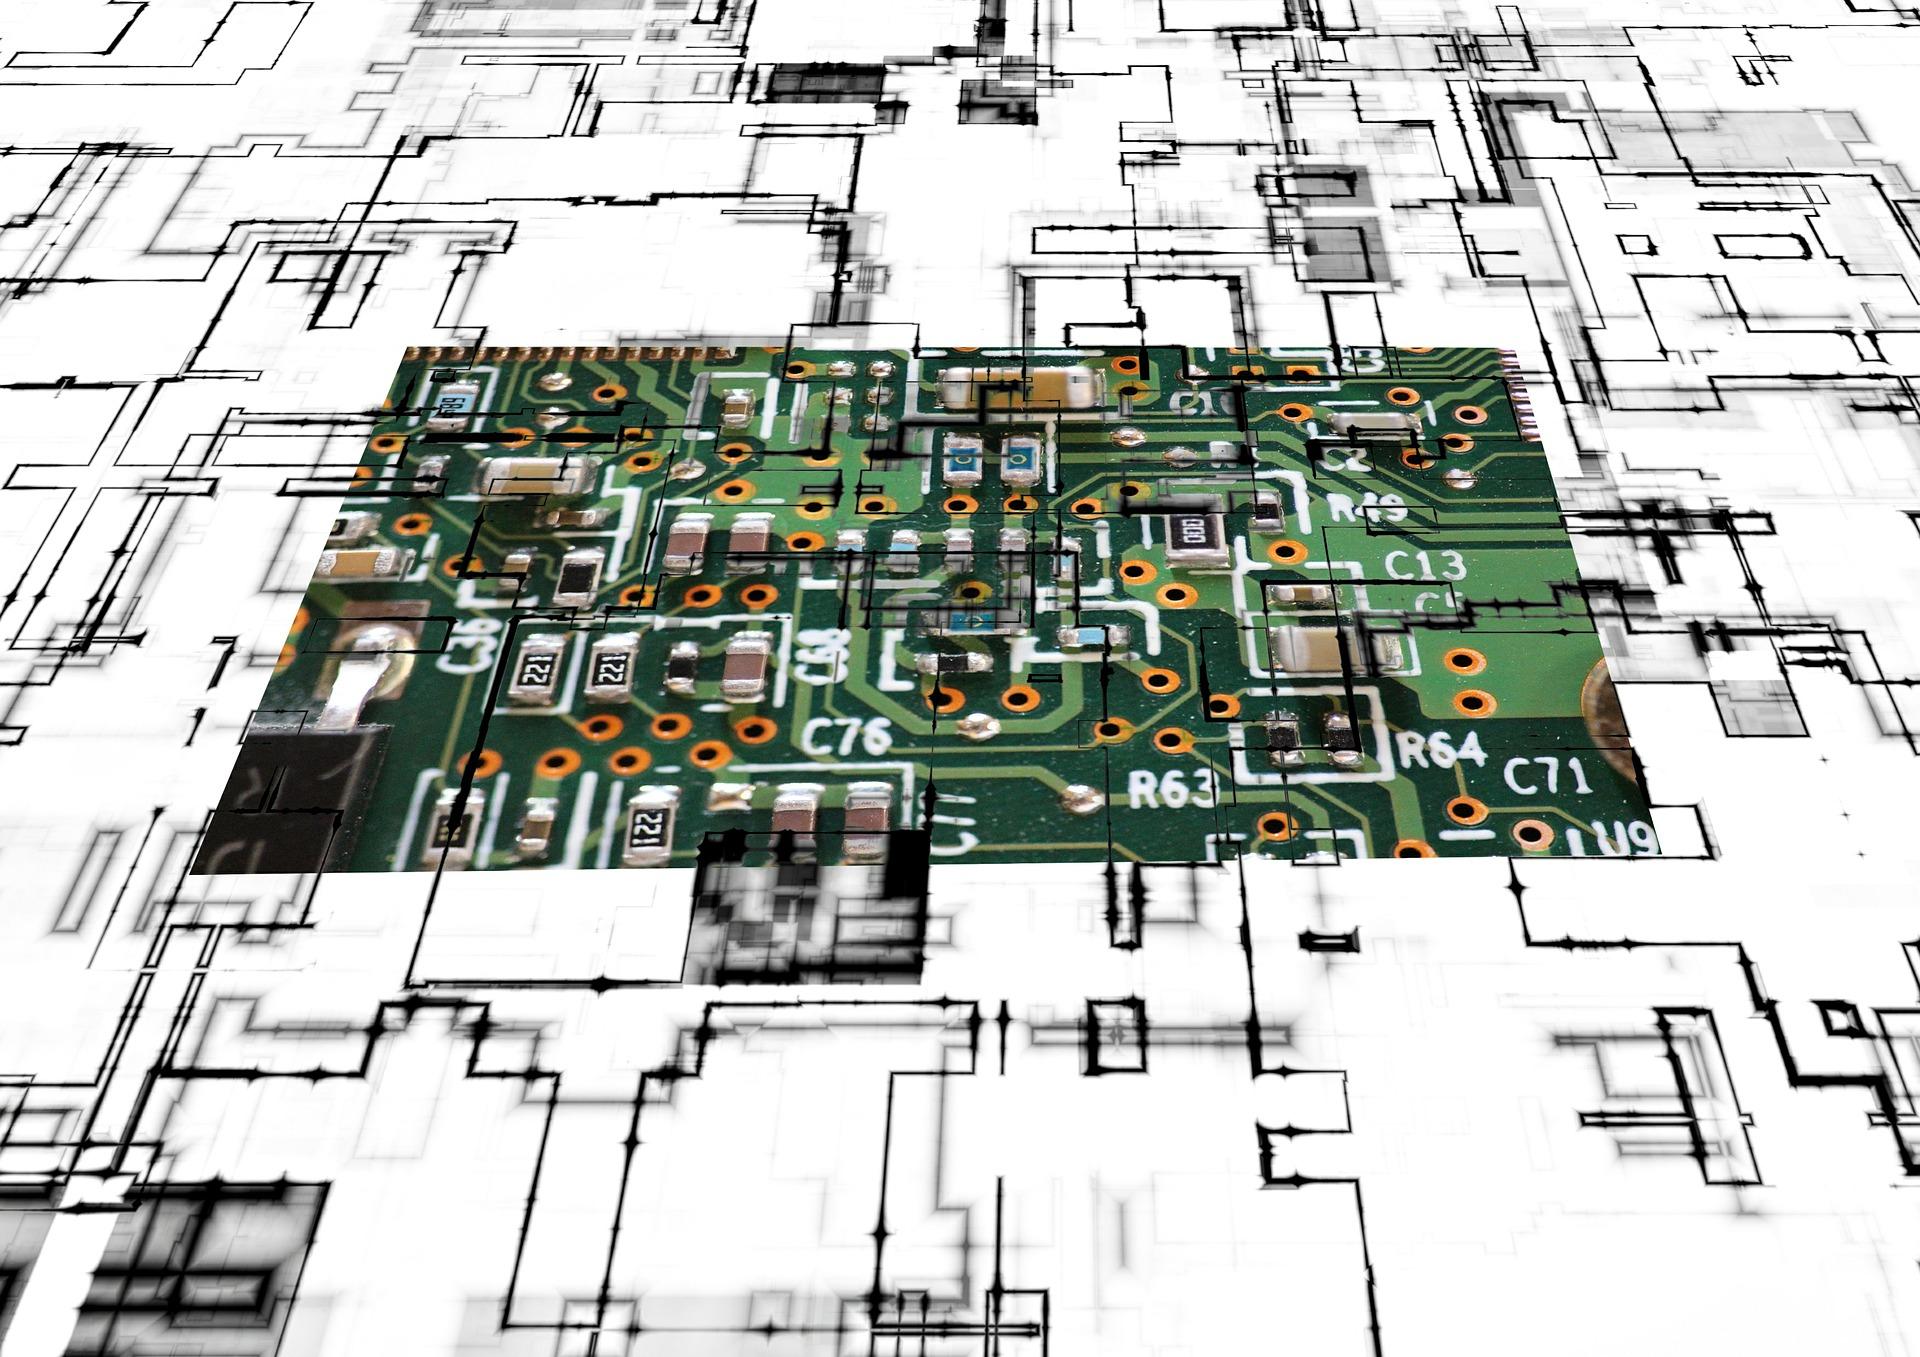 679 IT Engineering